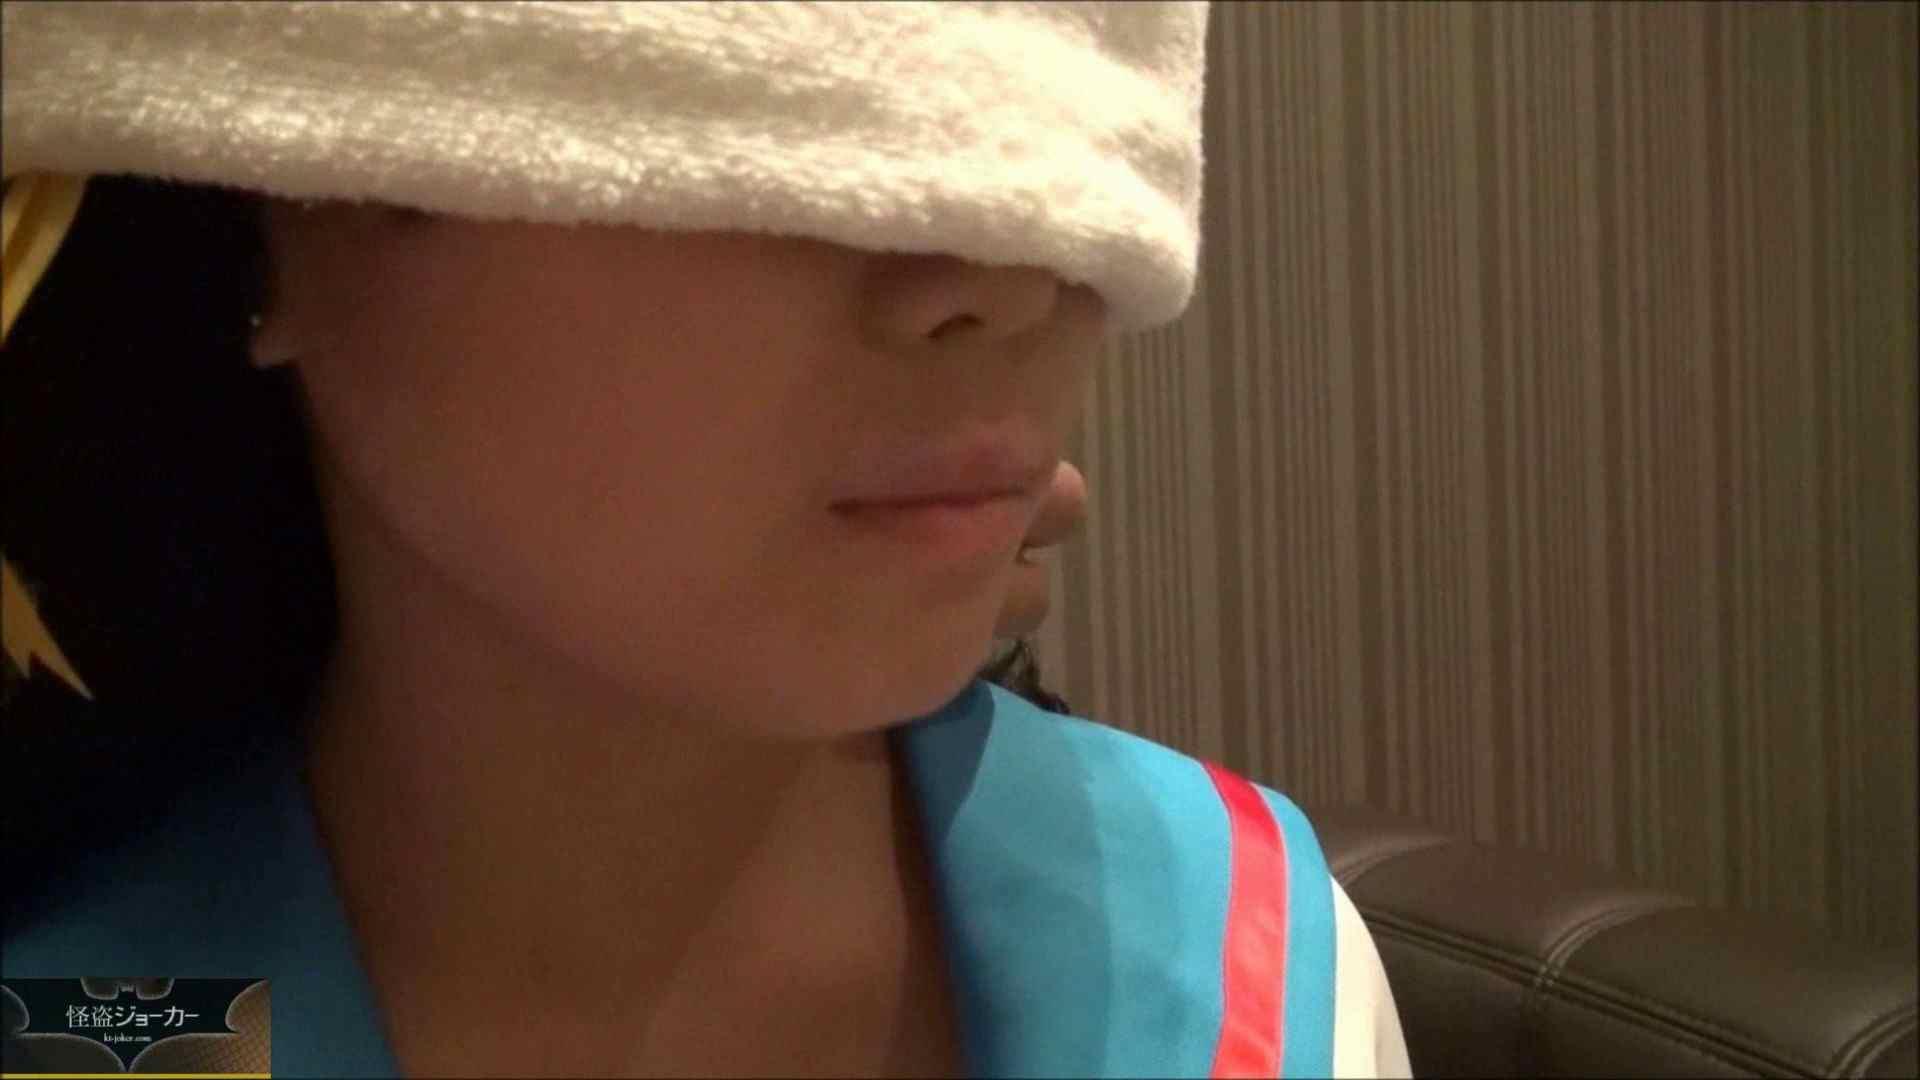 vol.76 {天然系☆若い娘}yuiちゃん_コスプレ撮影と騙してホテルで… フェラ・シーン 戯れ無修正画像 99枚 32